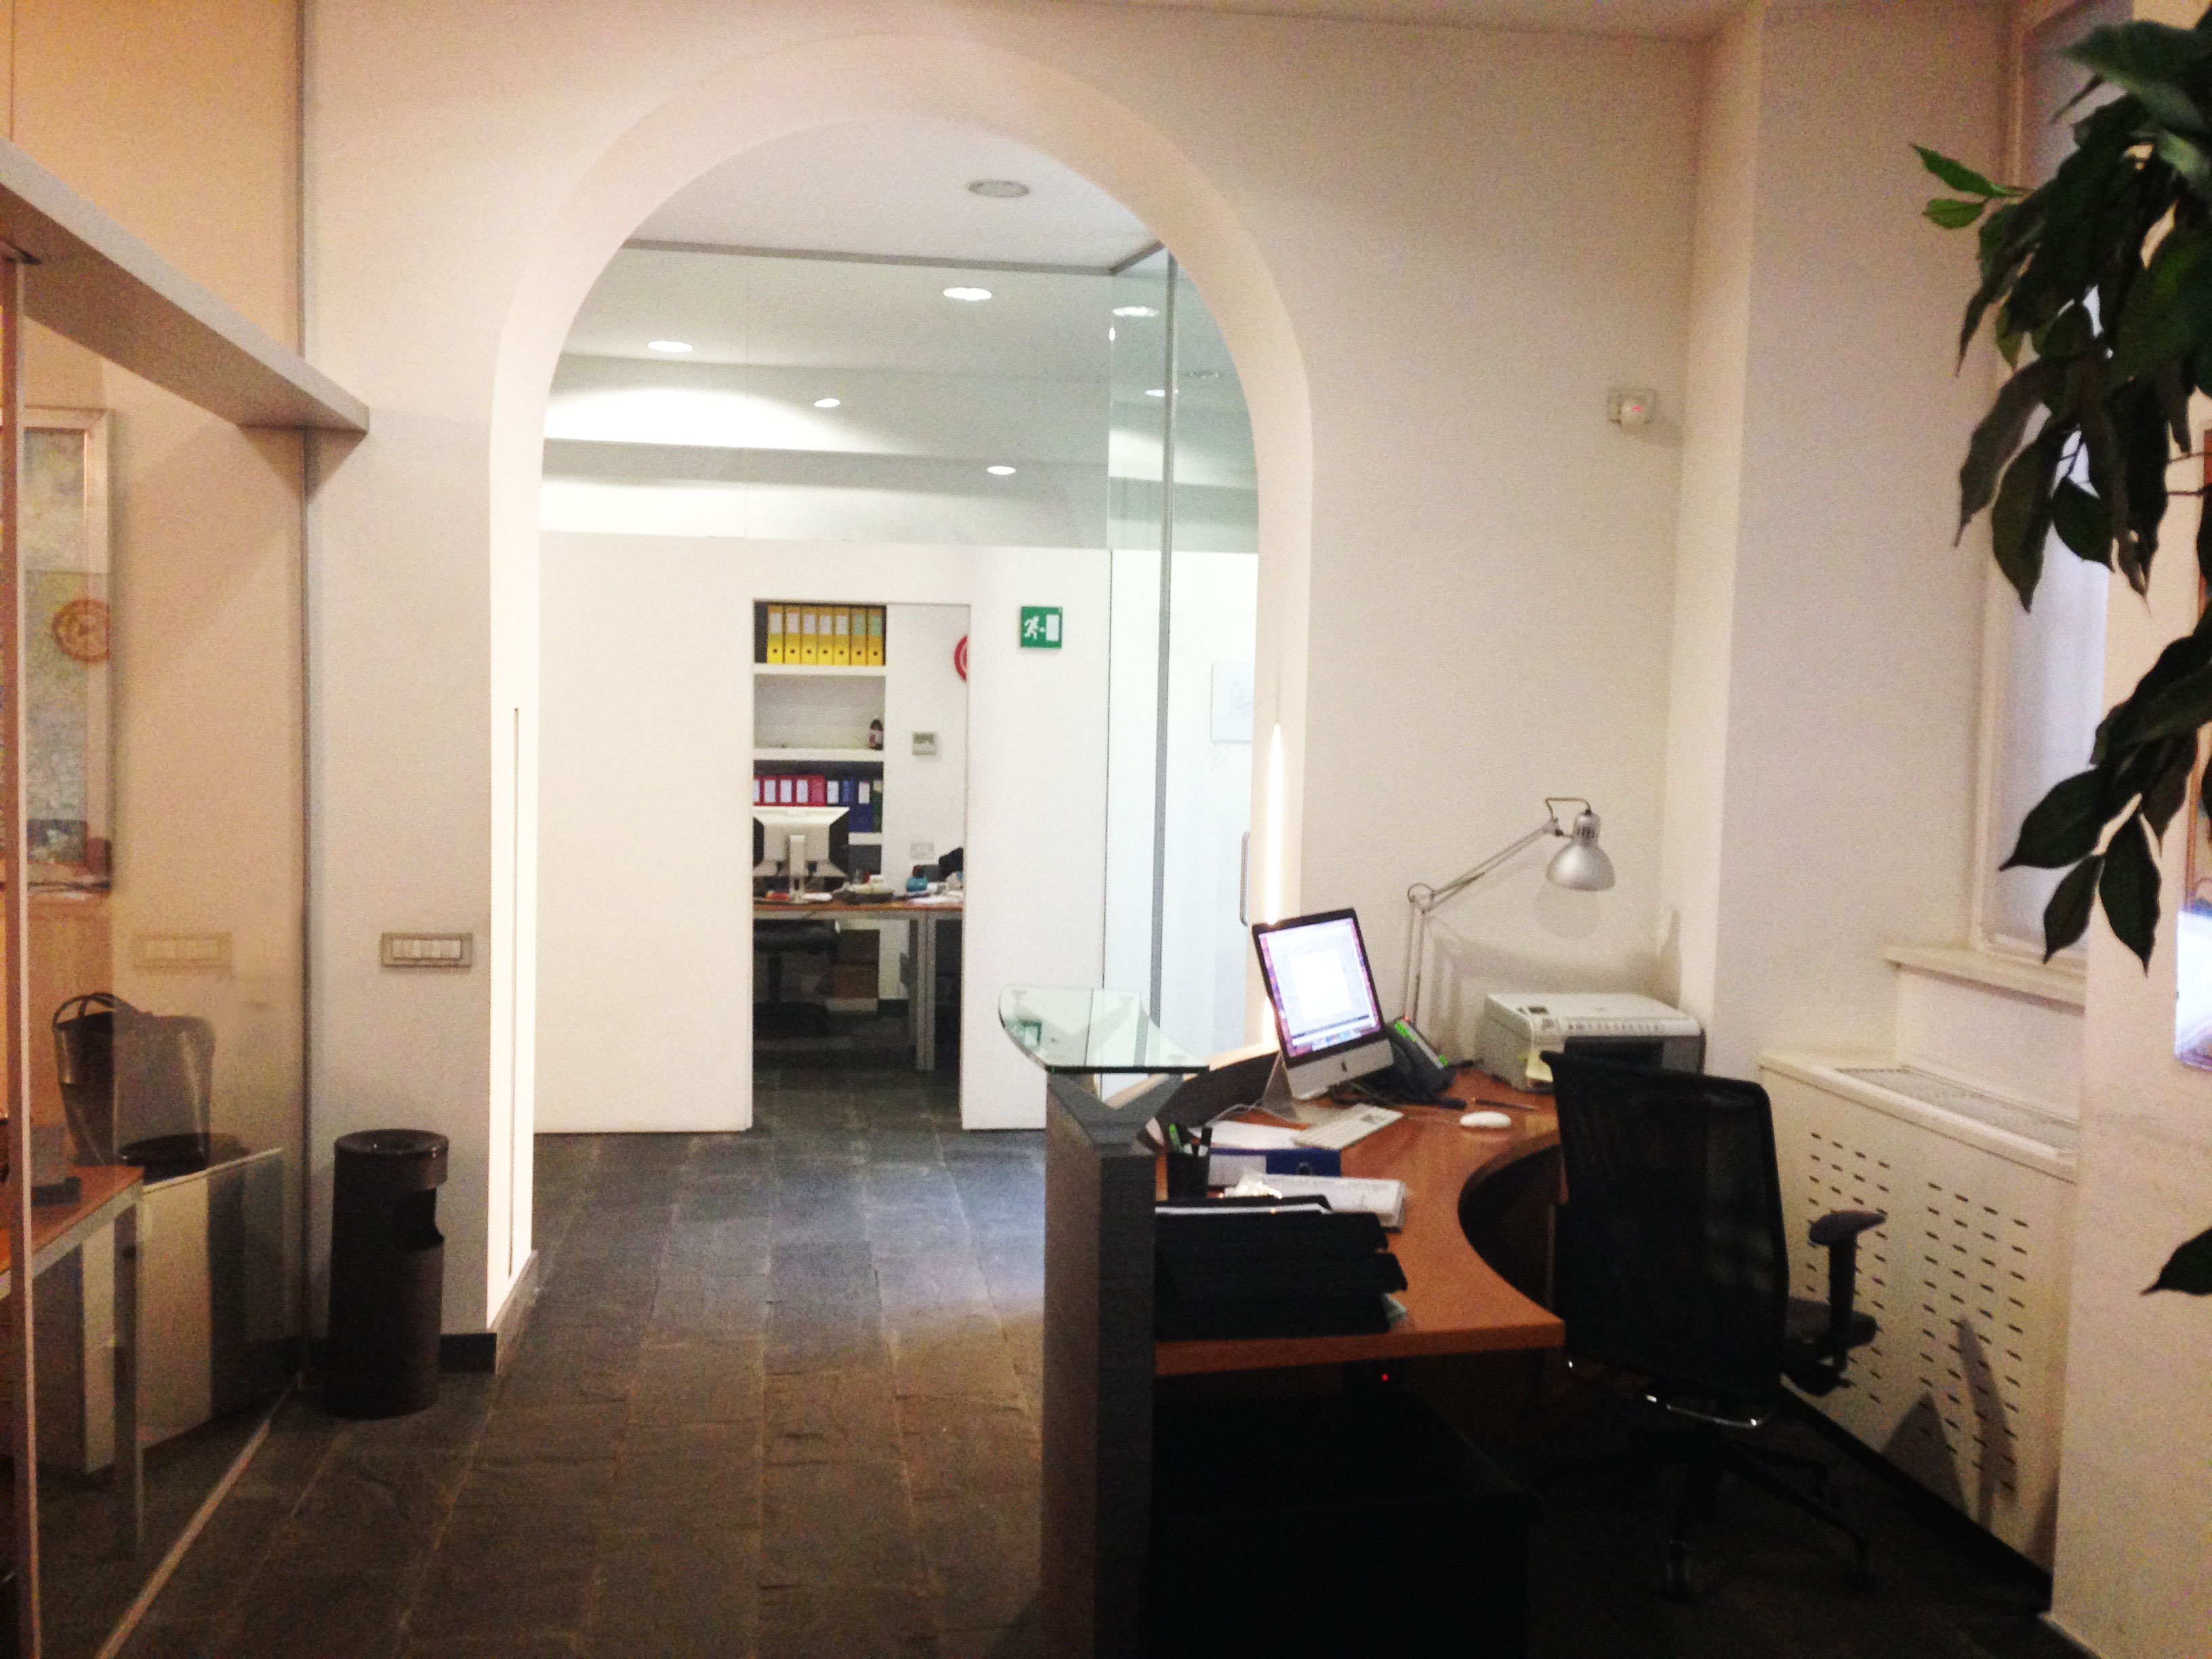 23HB Studio Audio | Office